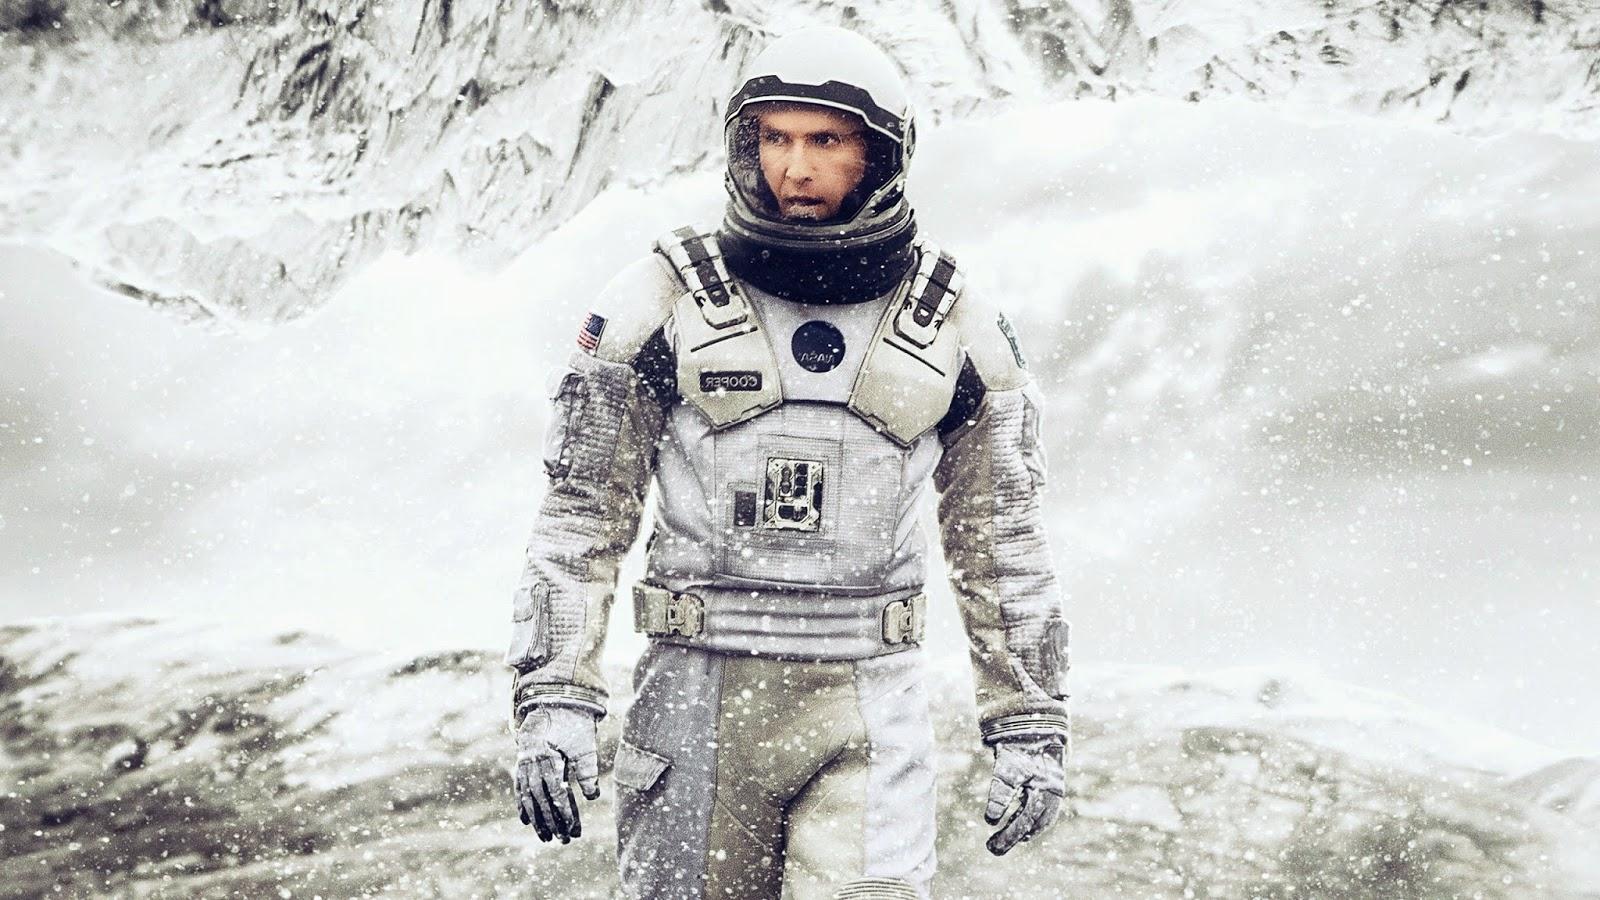 christopher nolans interstellar wallpapers - Six new images from Christopher Nolan s Interstellar